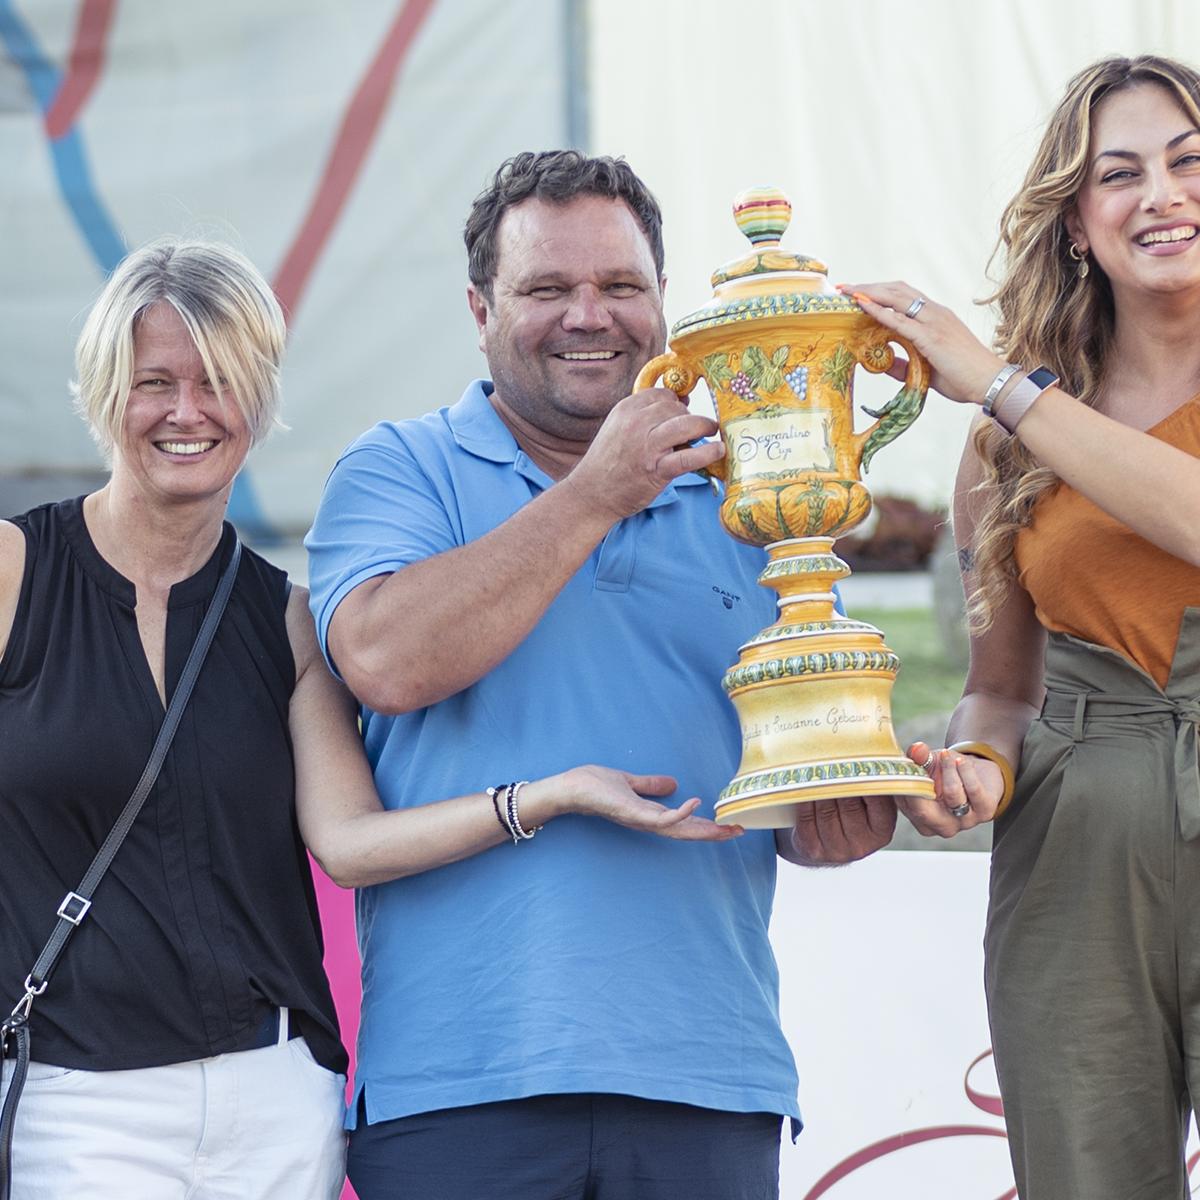 Winner Sagrantino Cup 2019